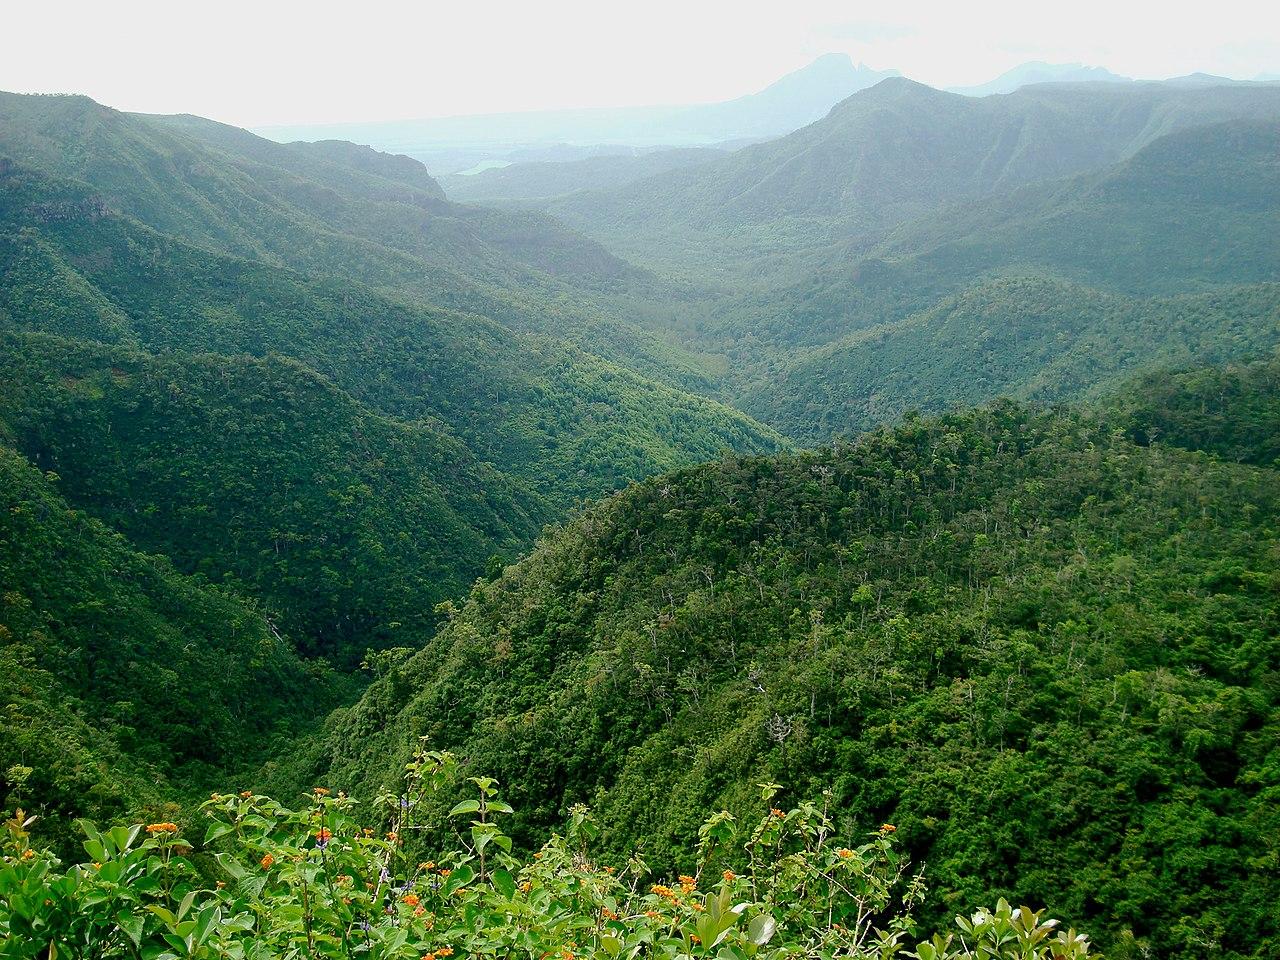 Black Rivers Gorges National Park